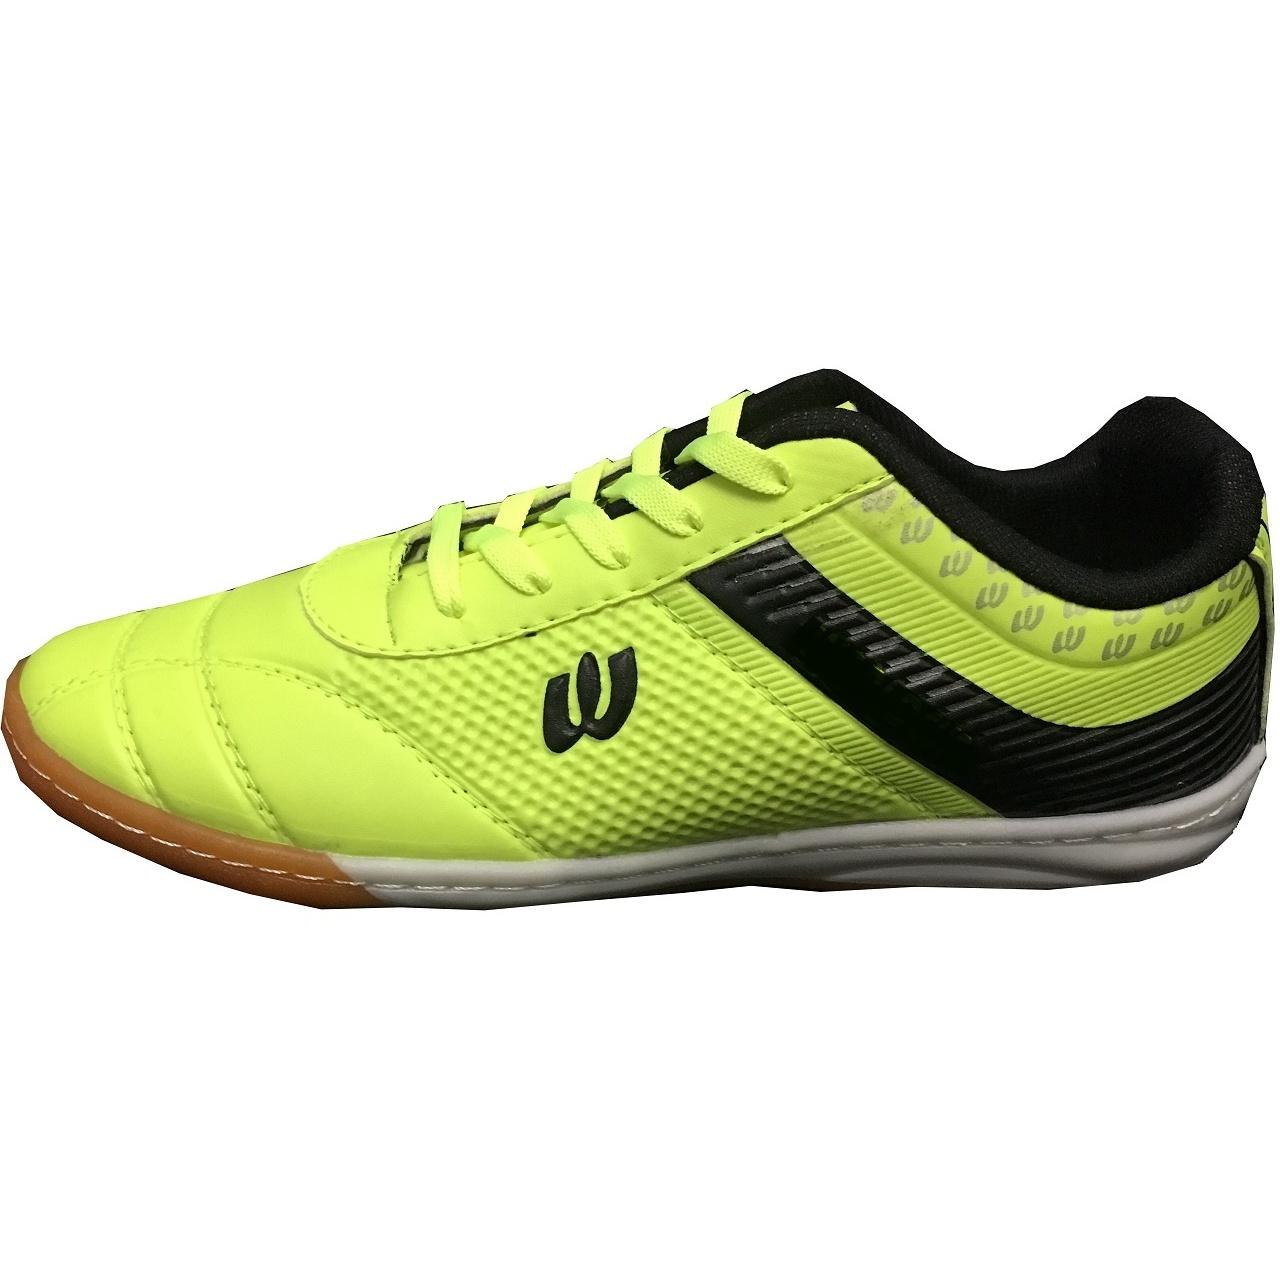 کفش فوتسال مردانه مدل WorldCup 01g